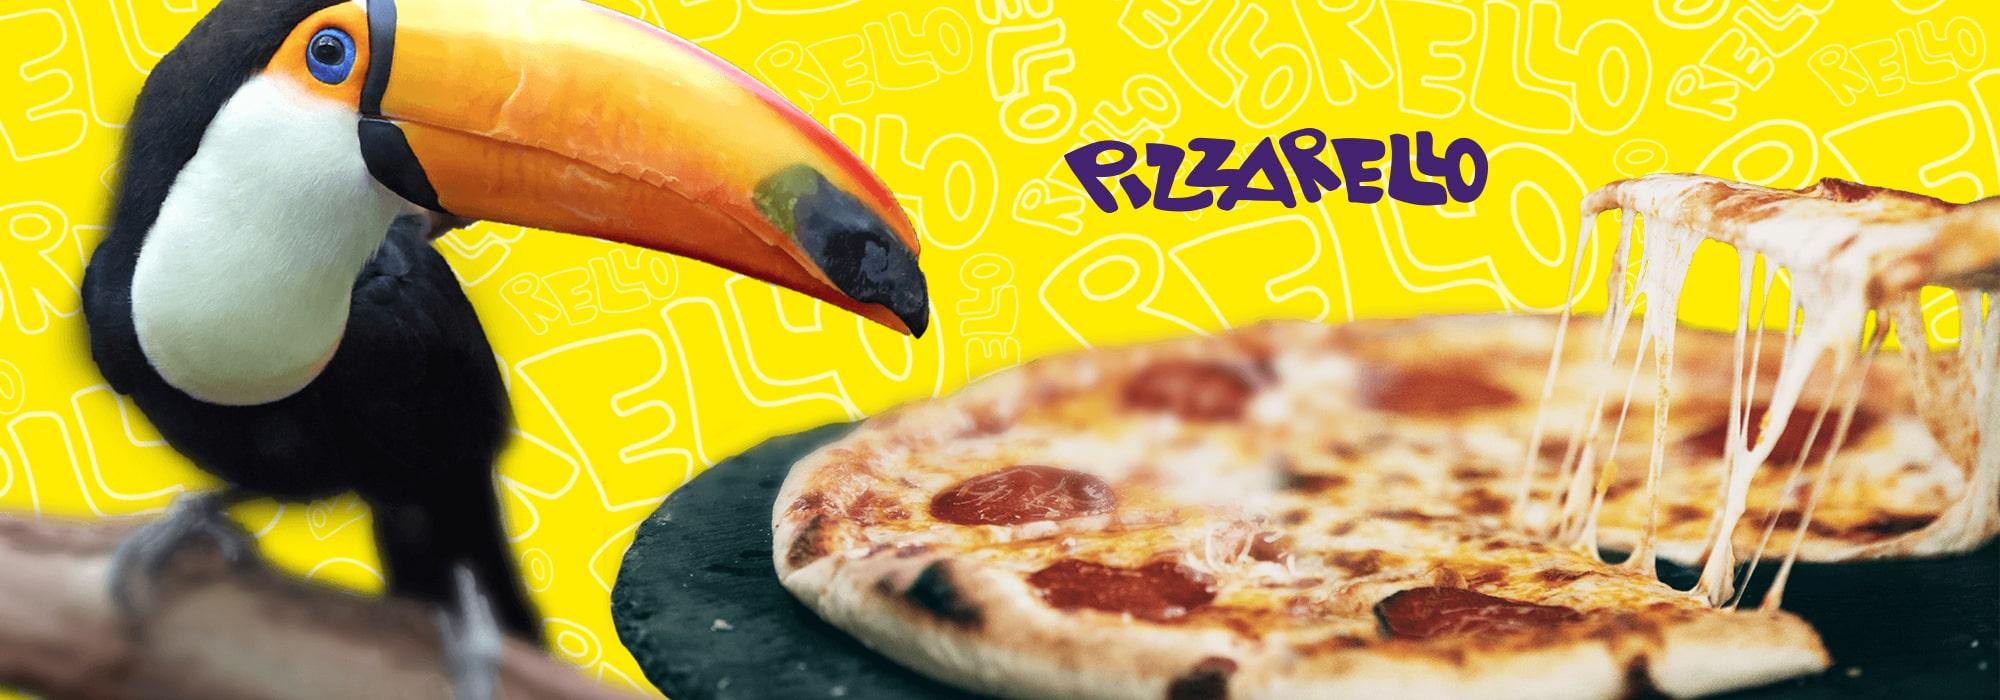 pizzarello-brandepites-nine-company-head-web-min